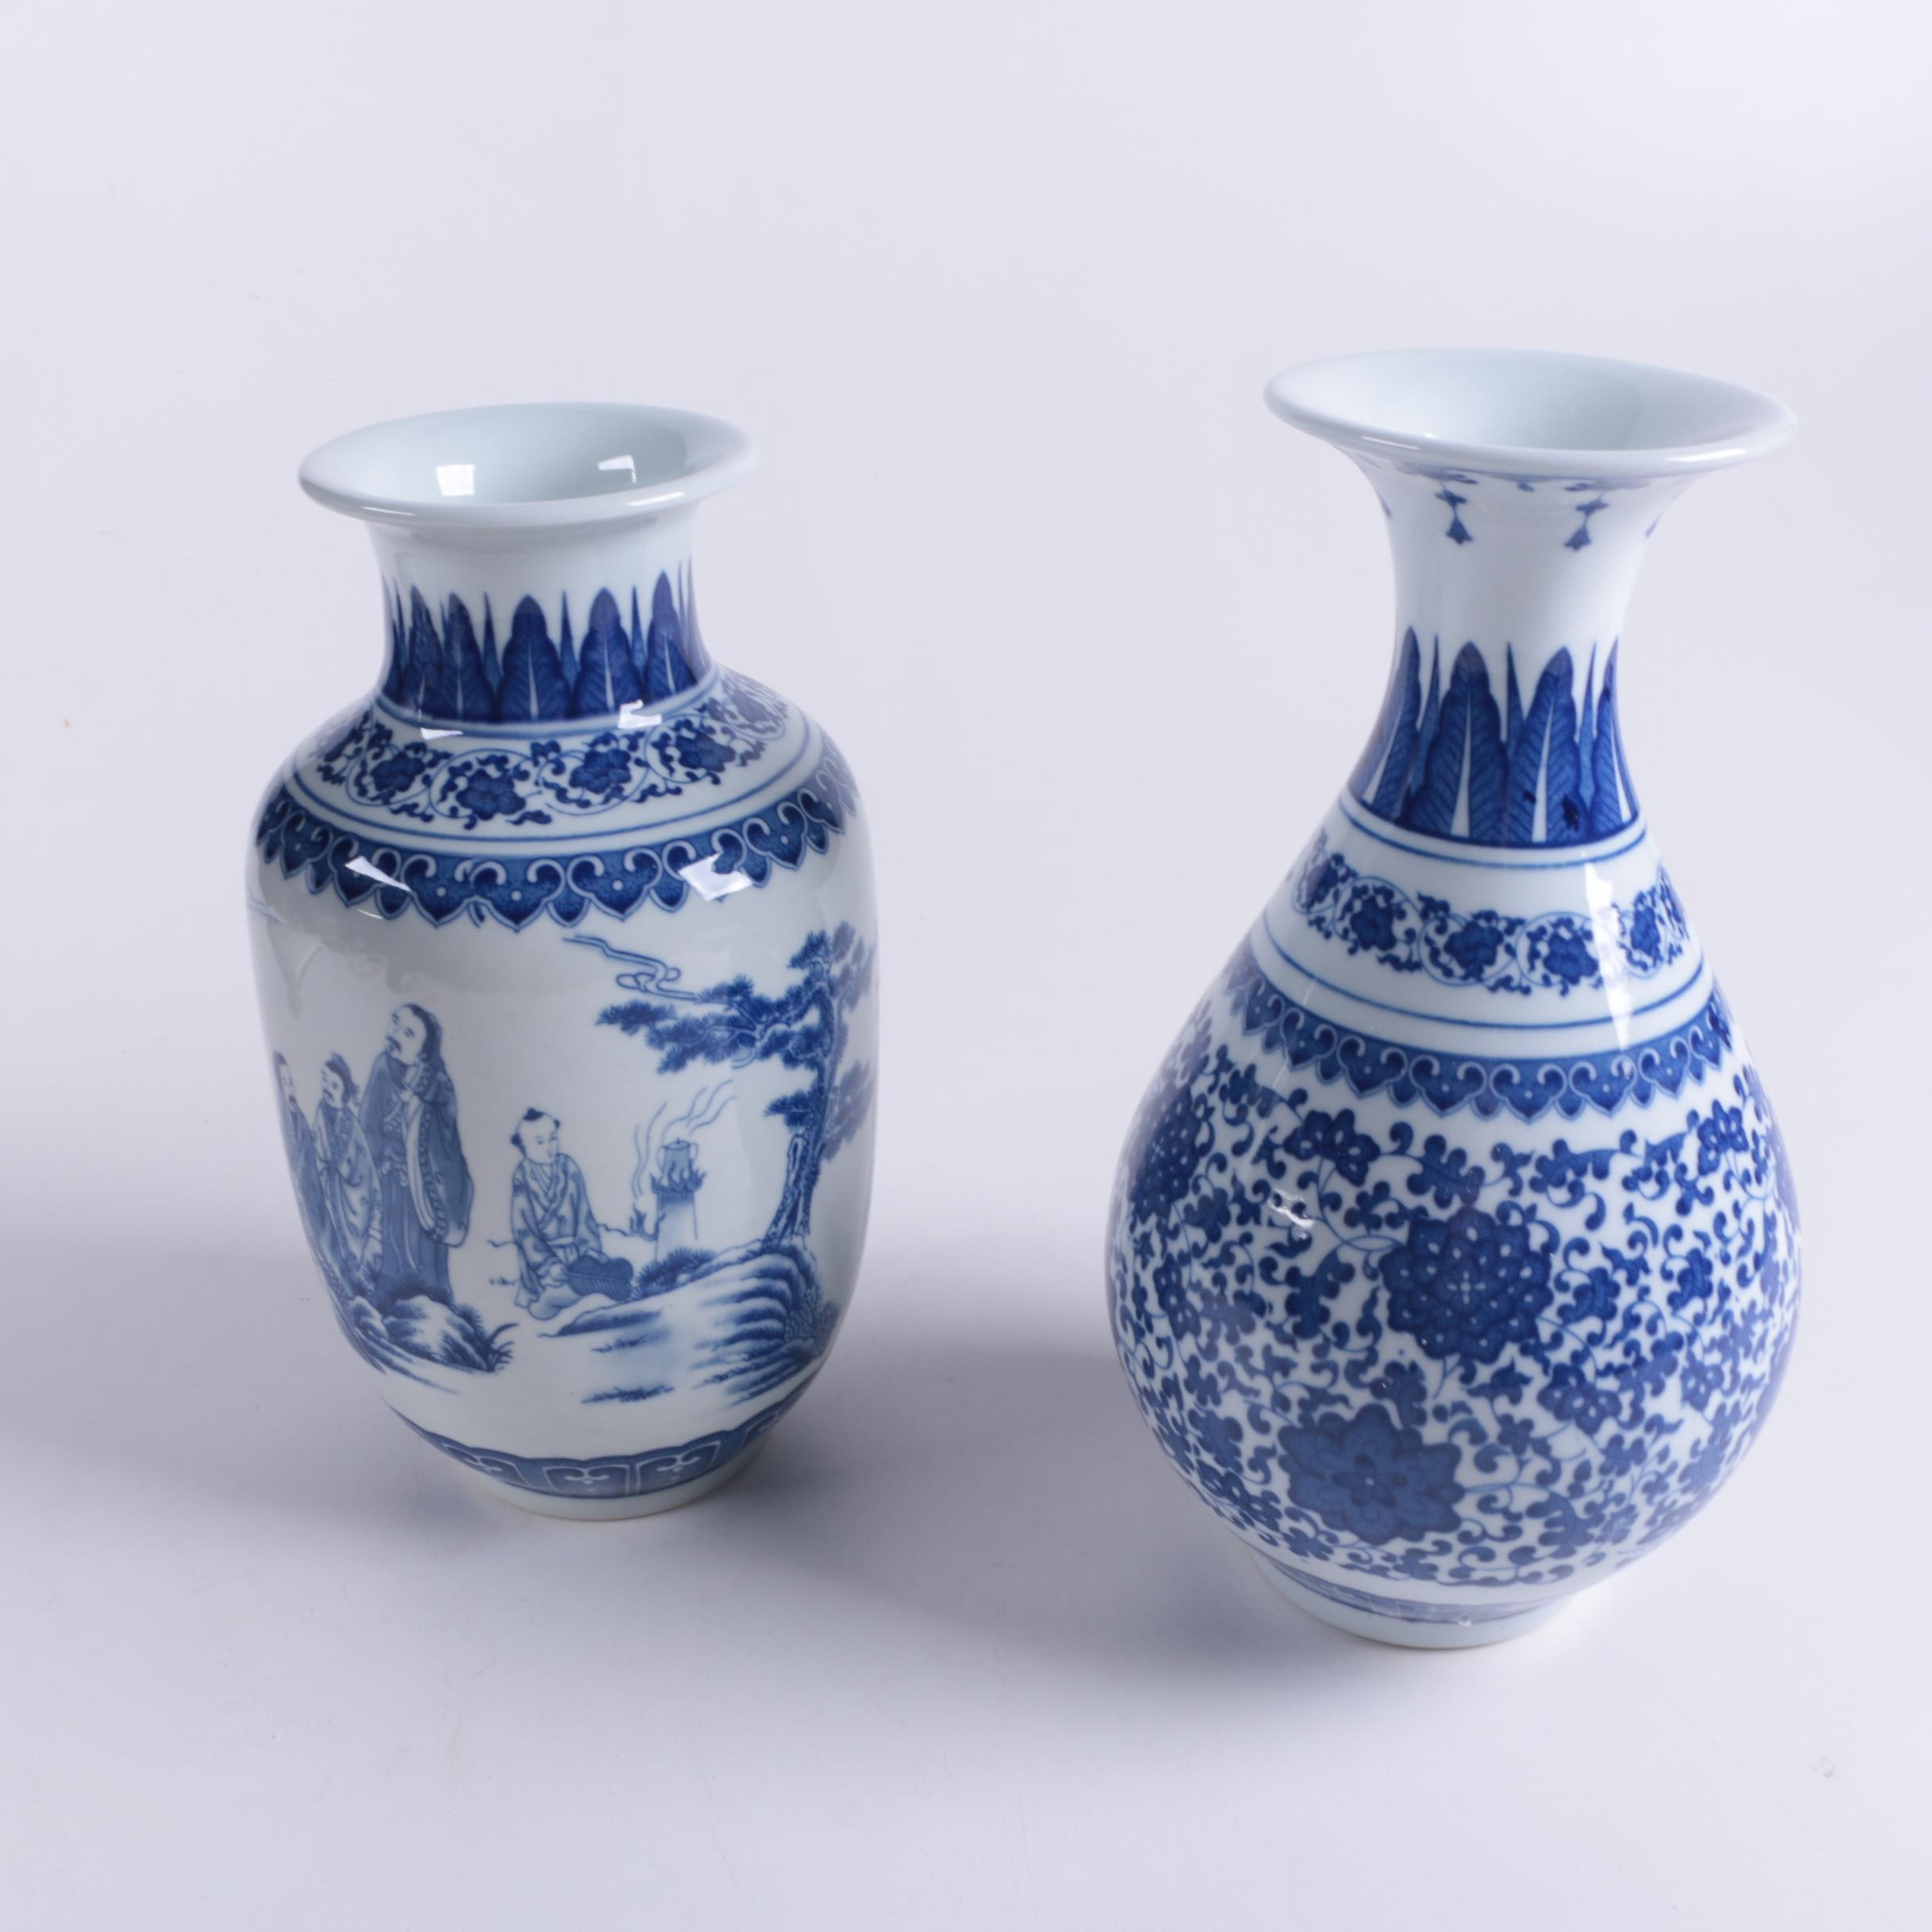 Chinese Blue and White Porcelain Vases